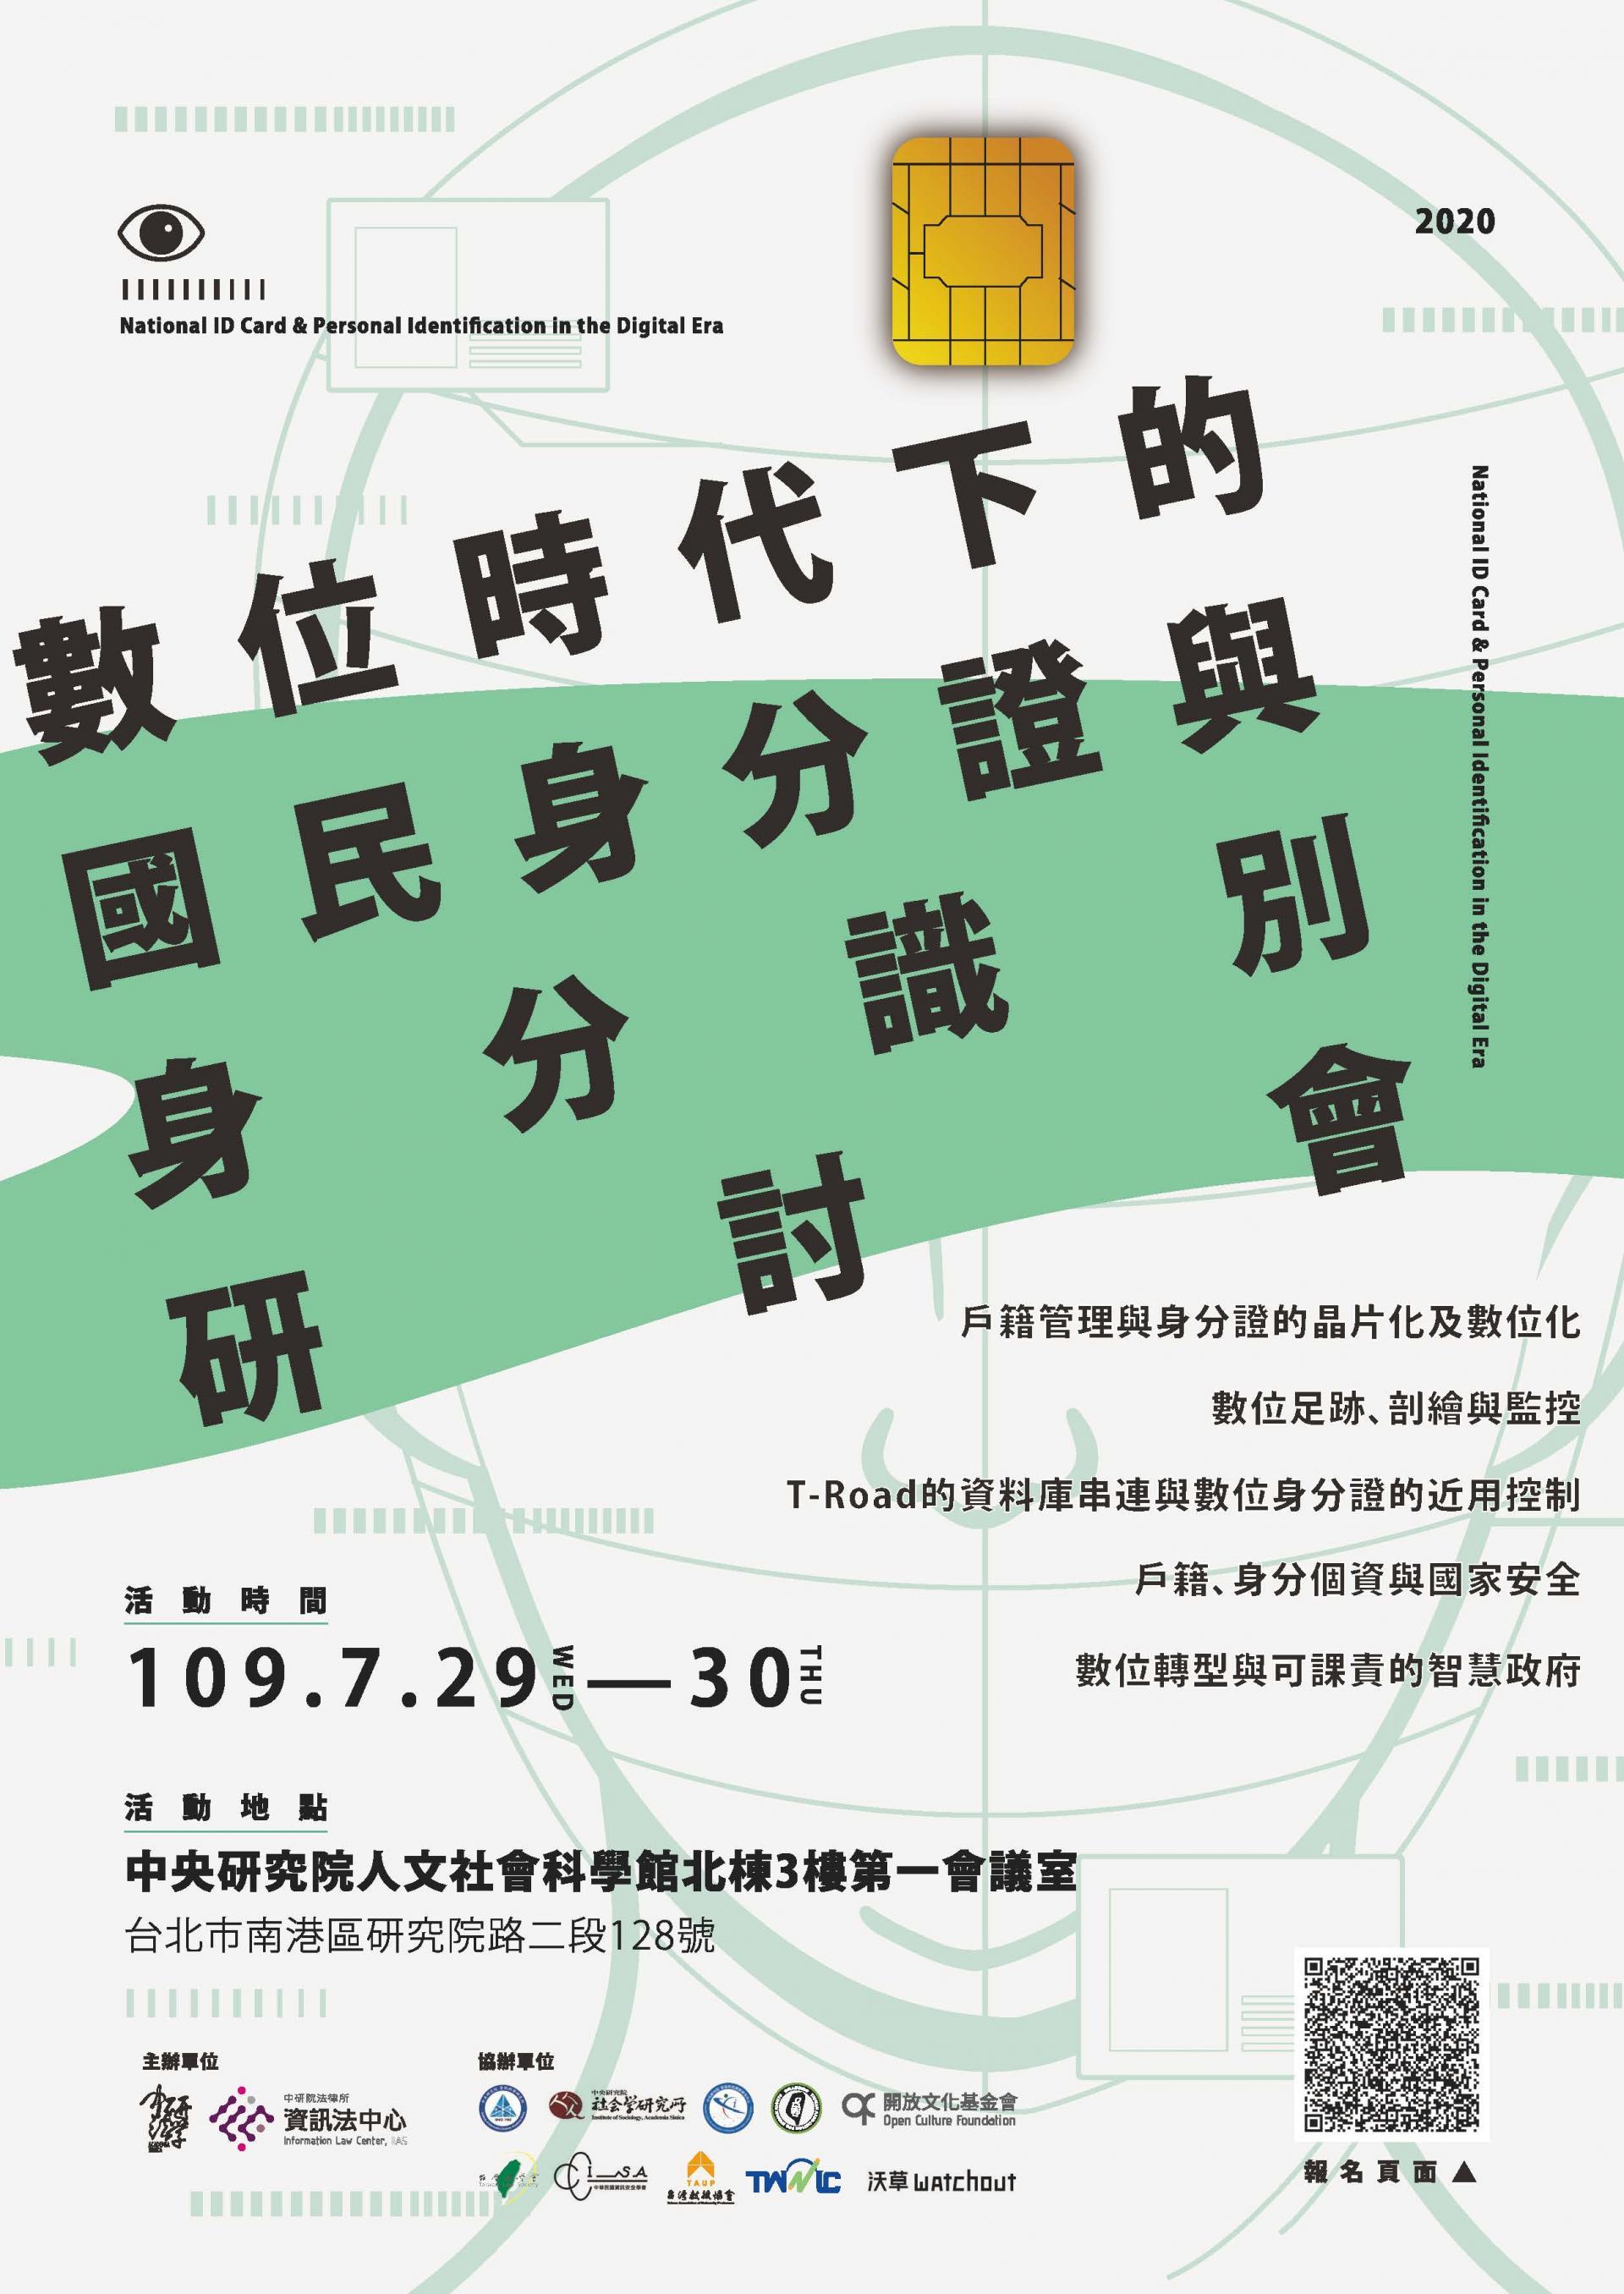 「數位時代下的國民身分證與身分識別」研討會(National ID Card & Personal Identification in the Digital Era)-poster